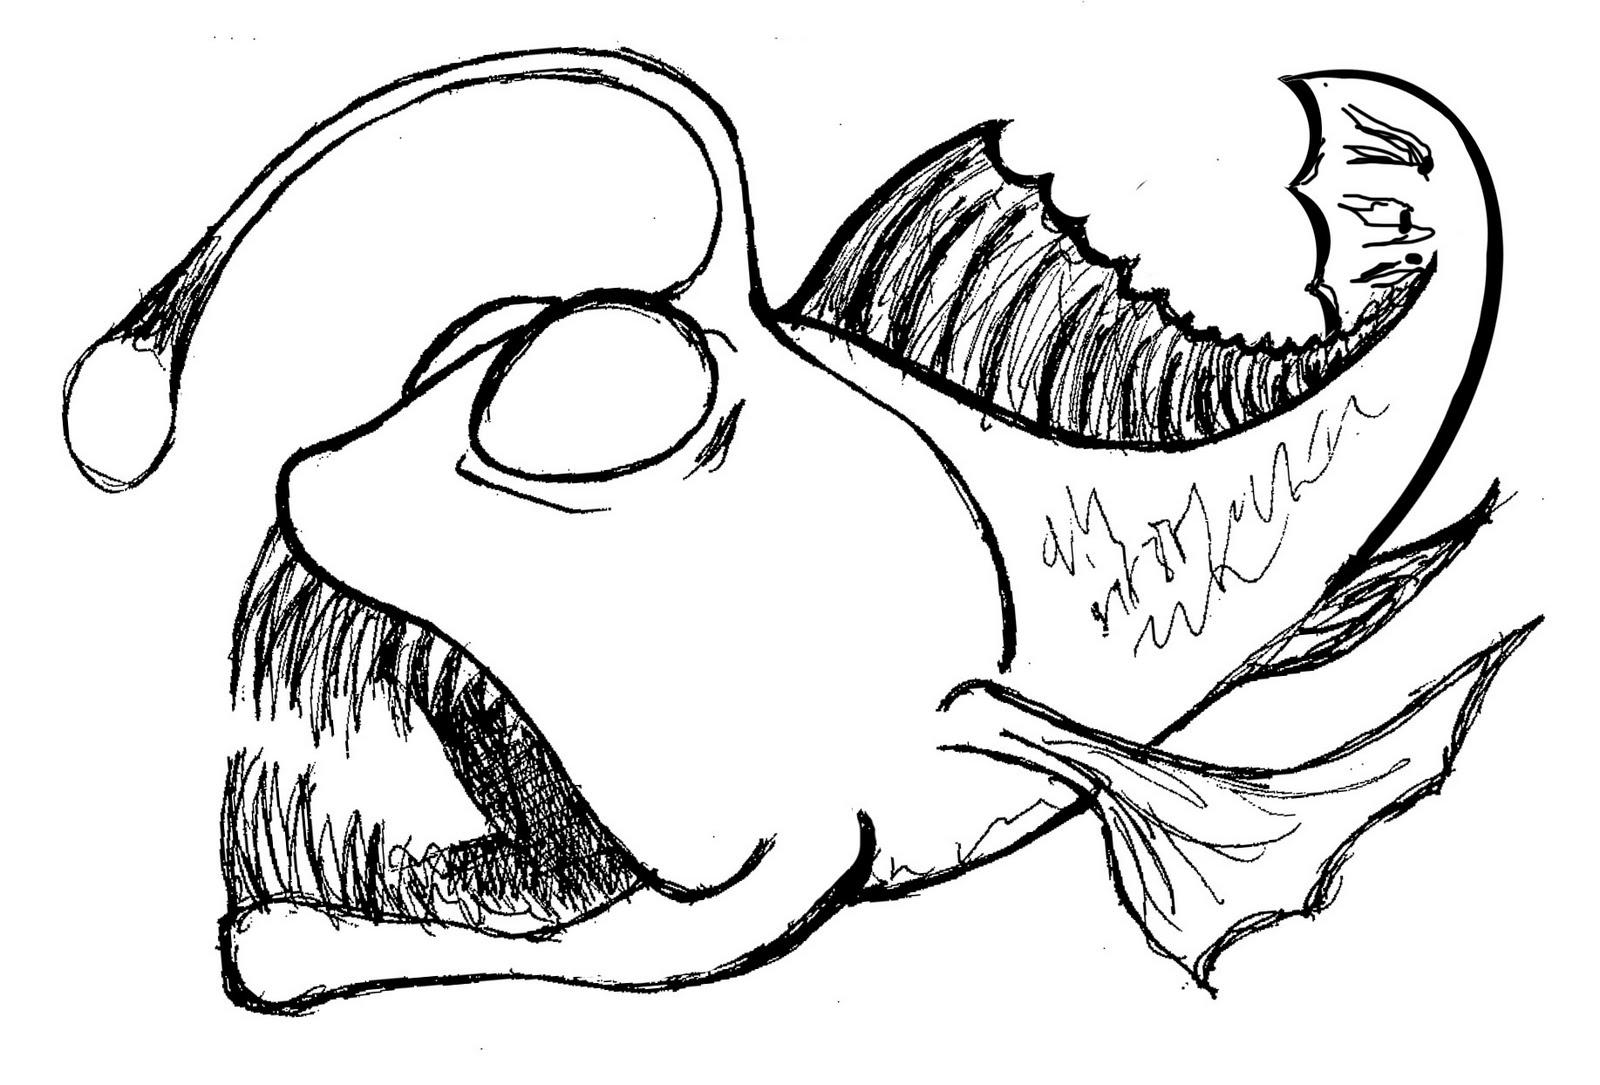 Fish Drawing In Pencil At Getdrawings